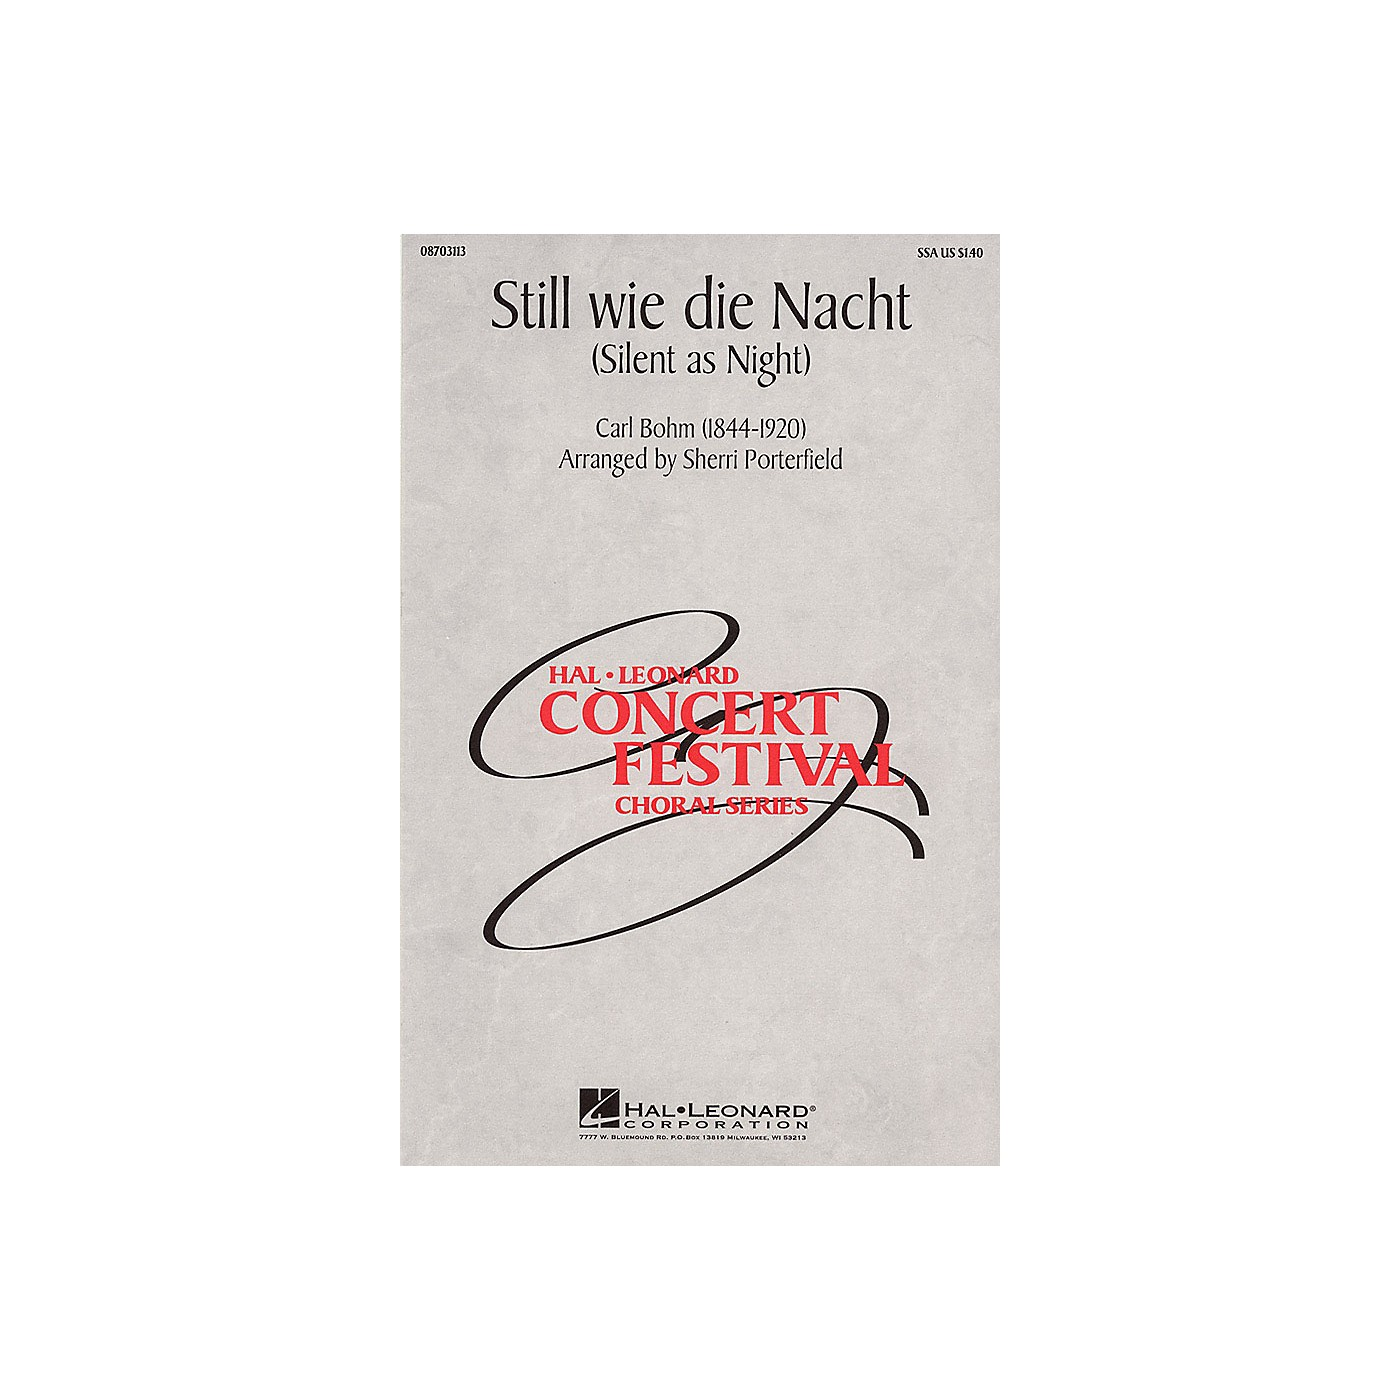 Hal Leonard Still wie die Nacht (Silent As Night) SSA arranged by Sherri Porterfield thumbnail